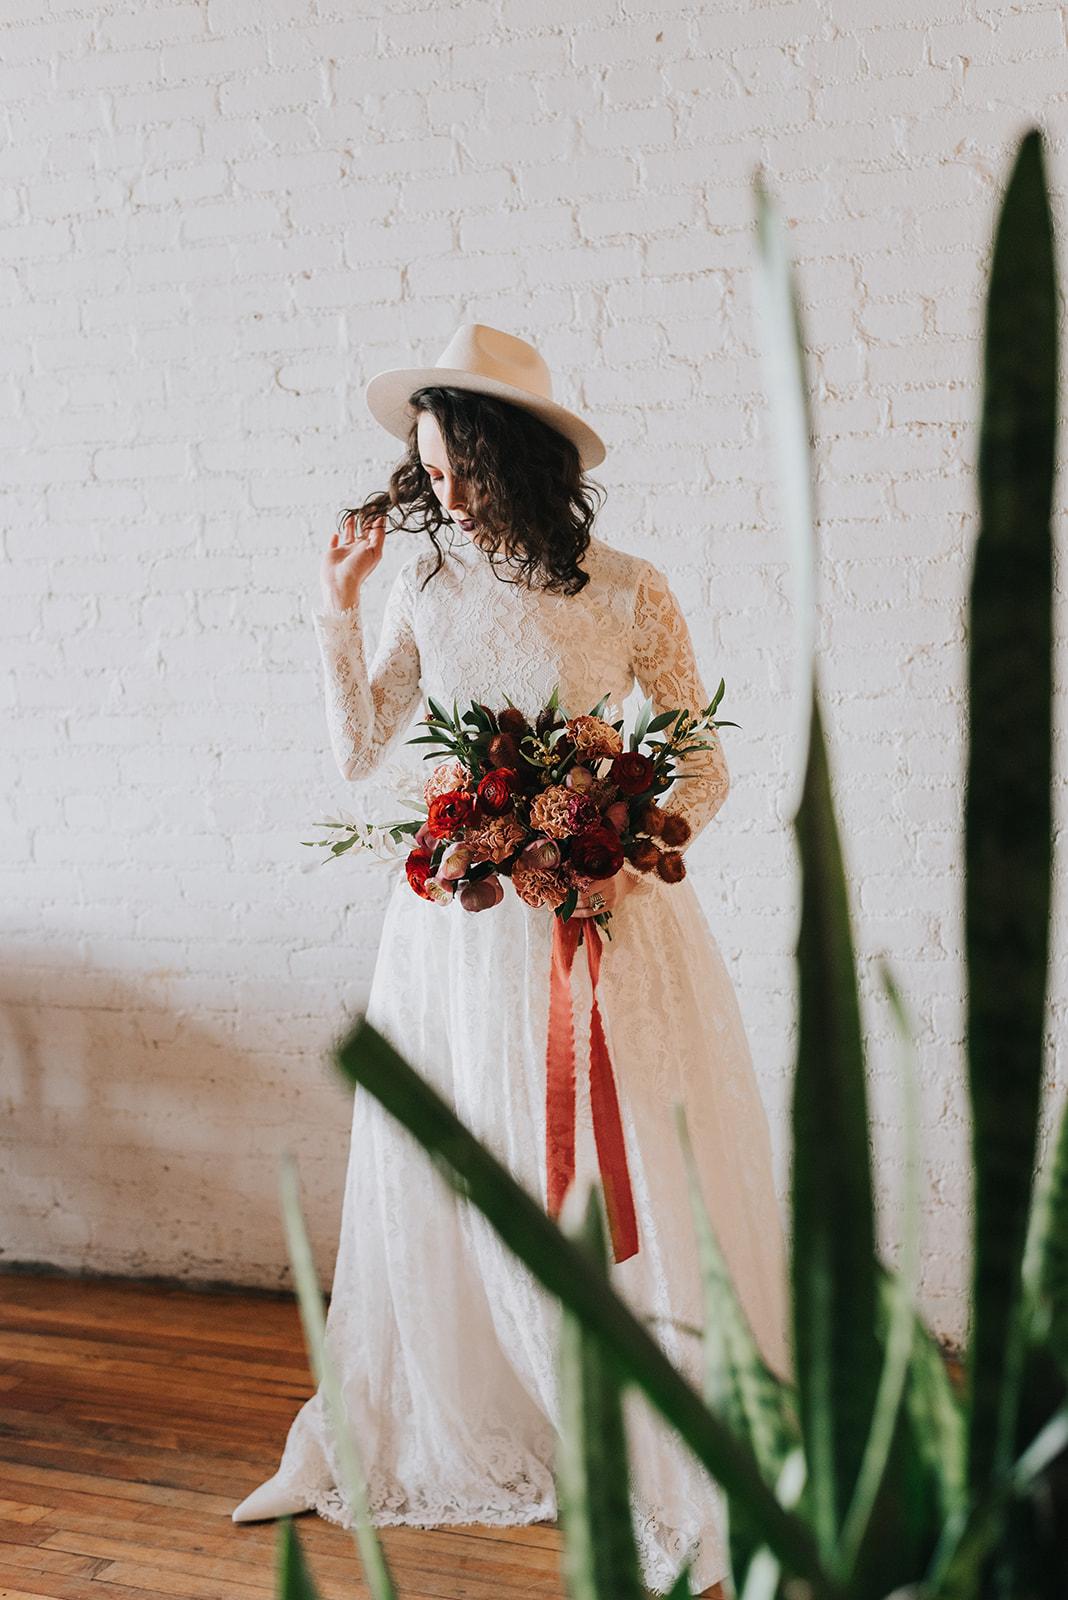 La-Brasa-somerville-intimate-boho-wedding-Boston-elopement